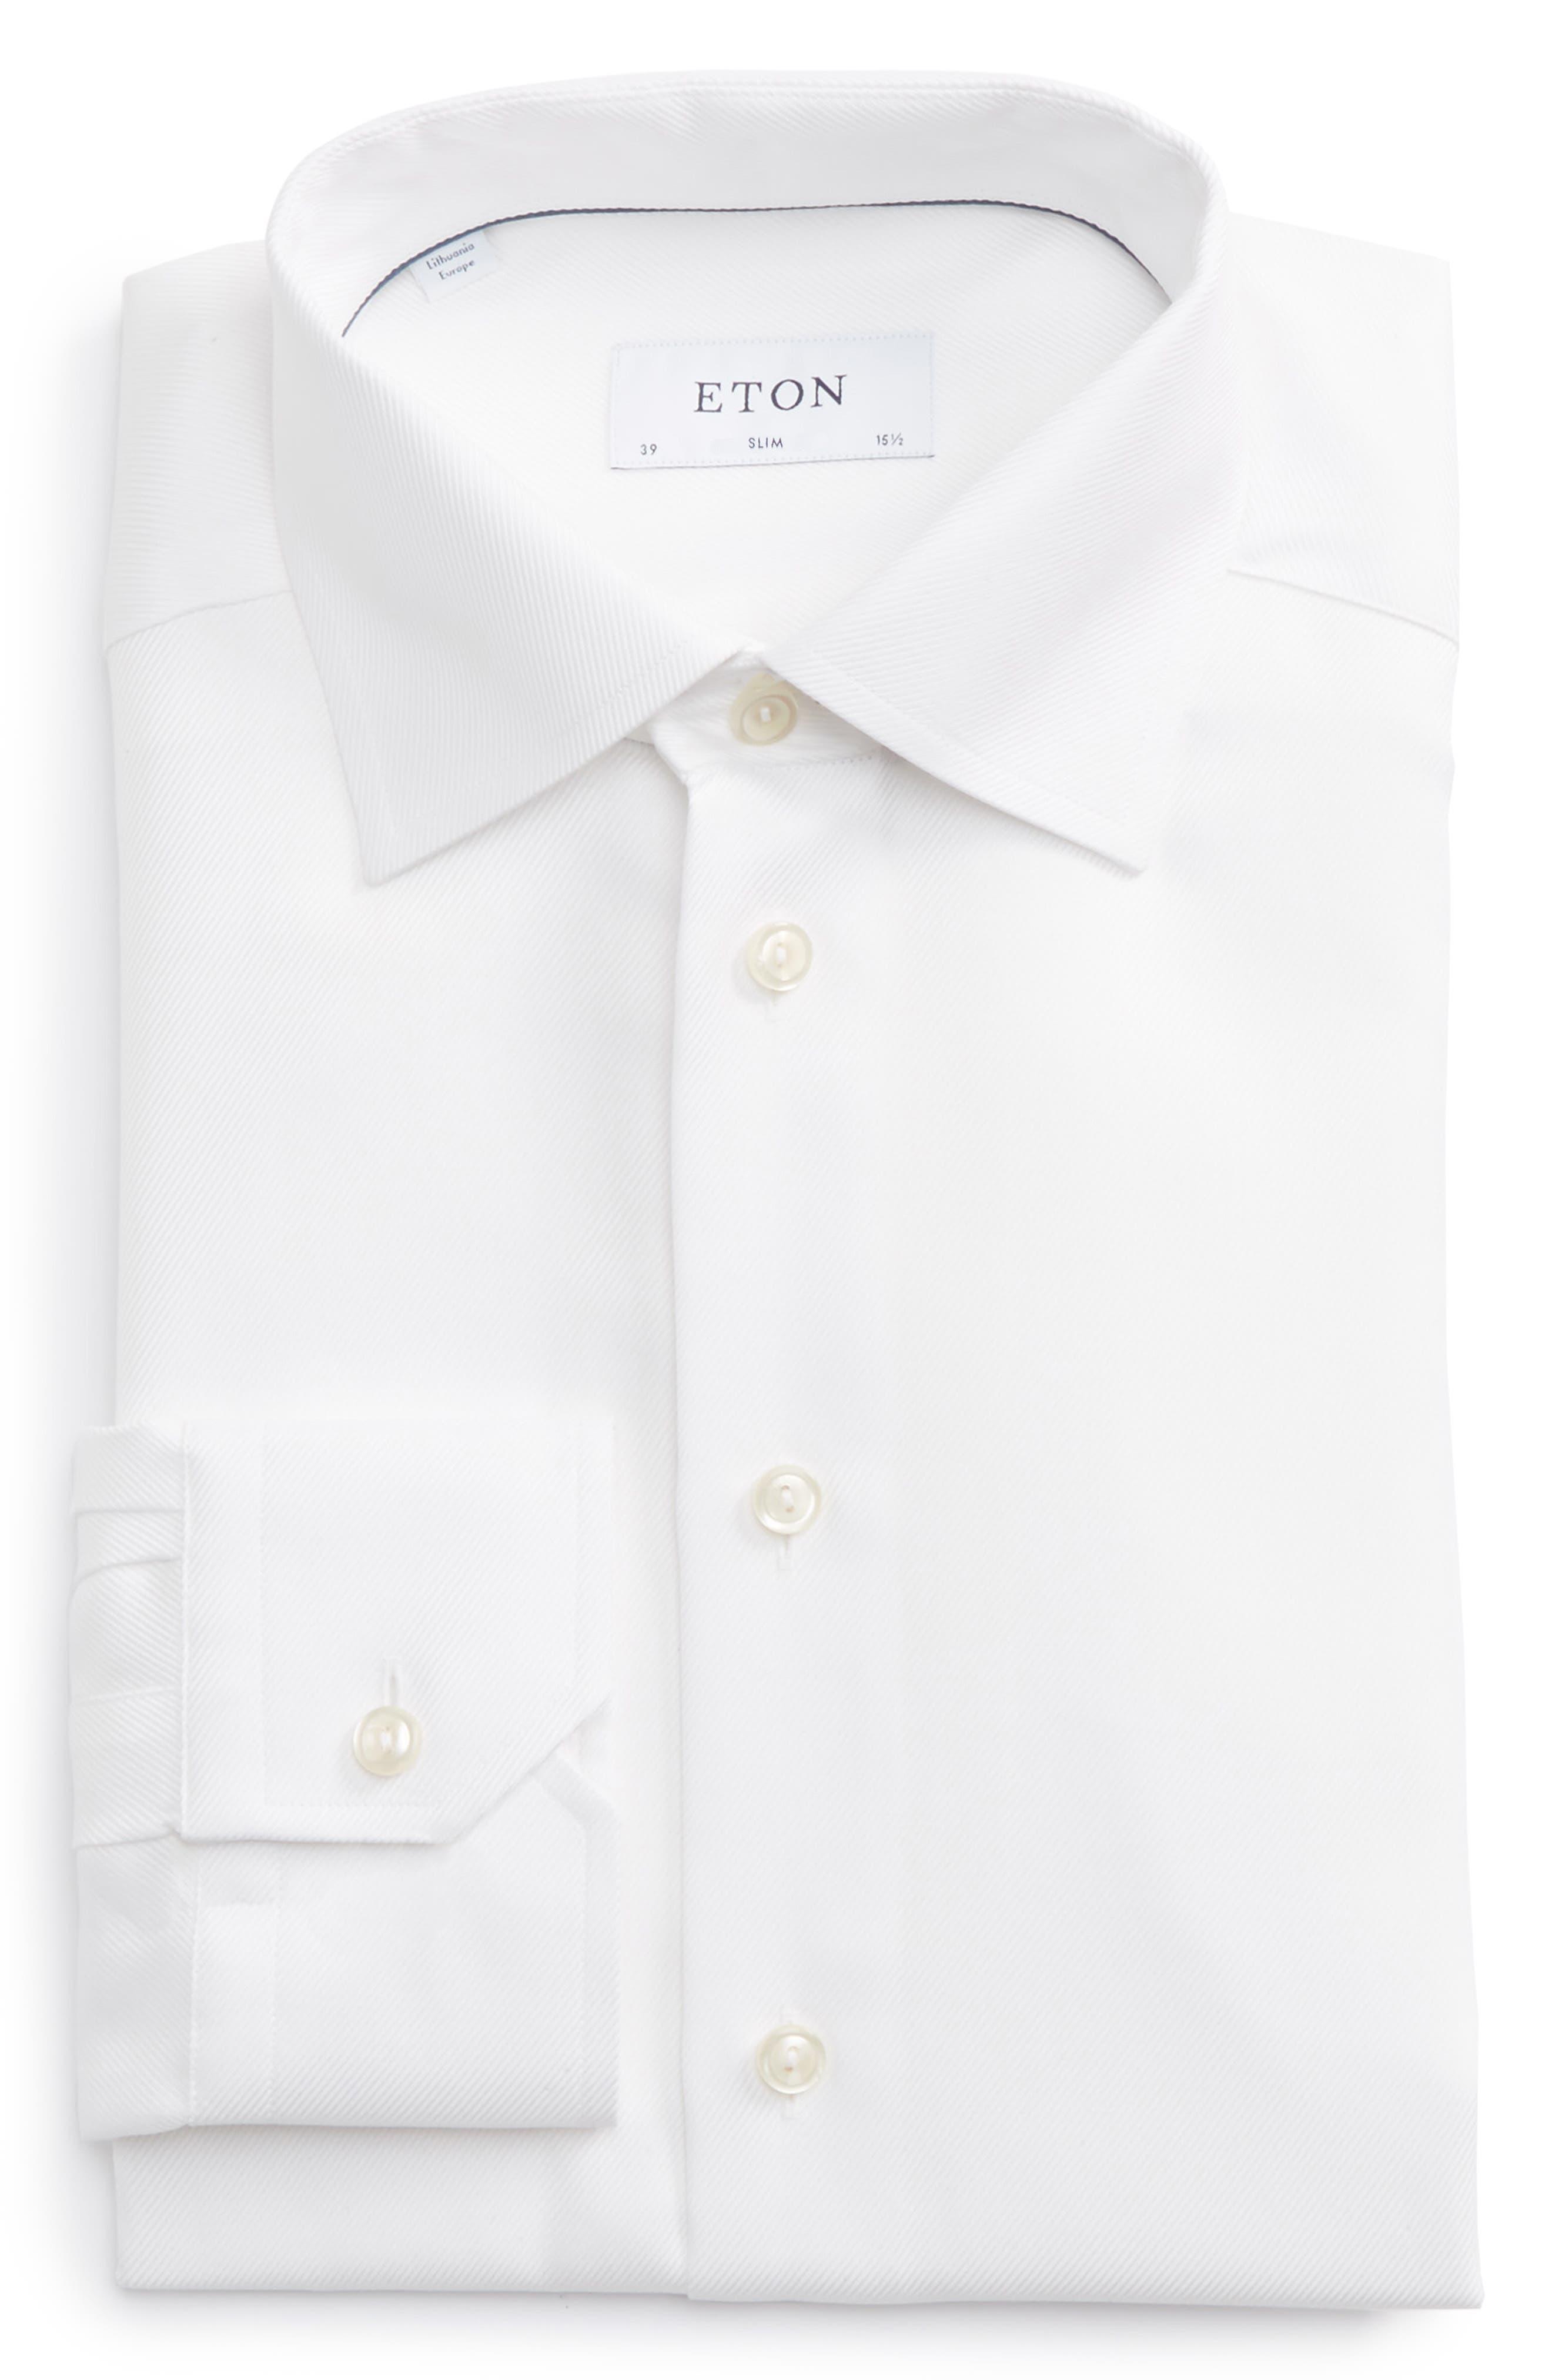 Alternate Image 1 Selected - Eton Slim Fit Cavalry Twill Dress Shirt